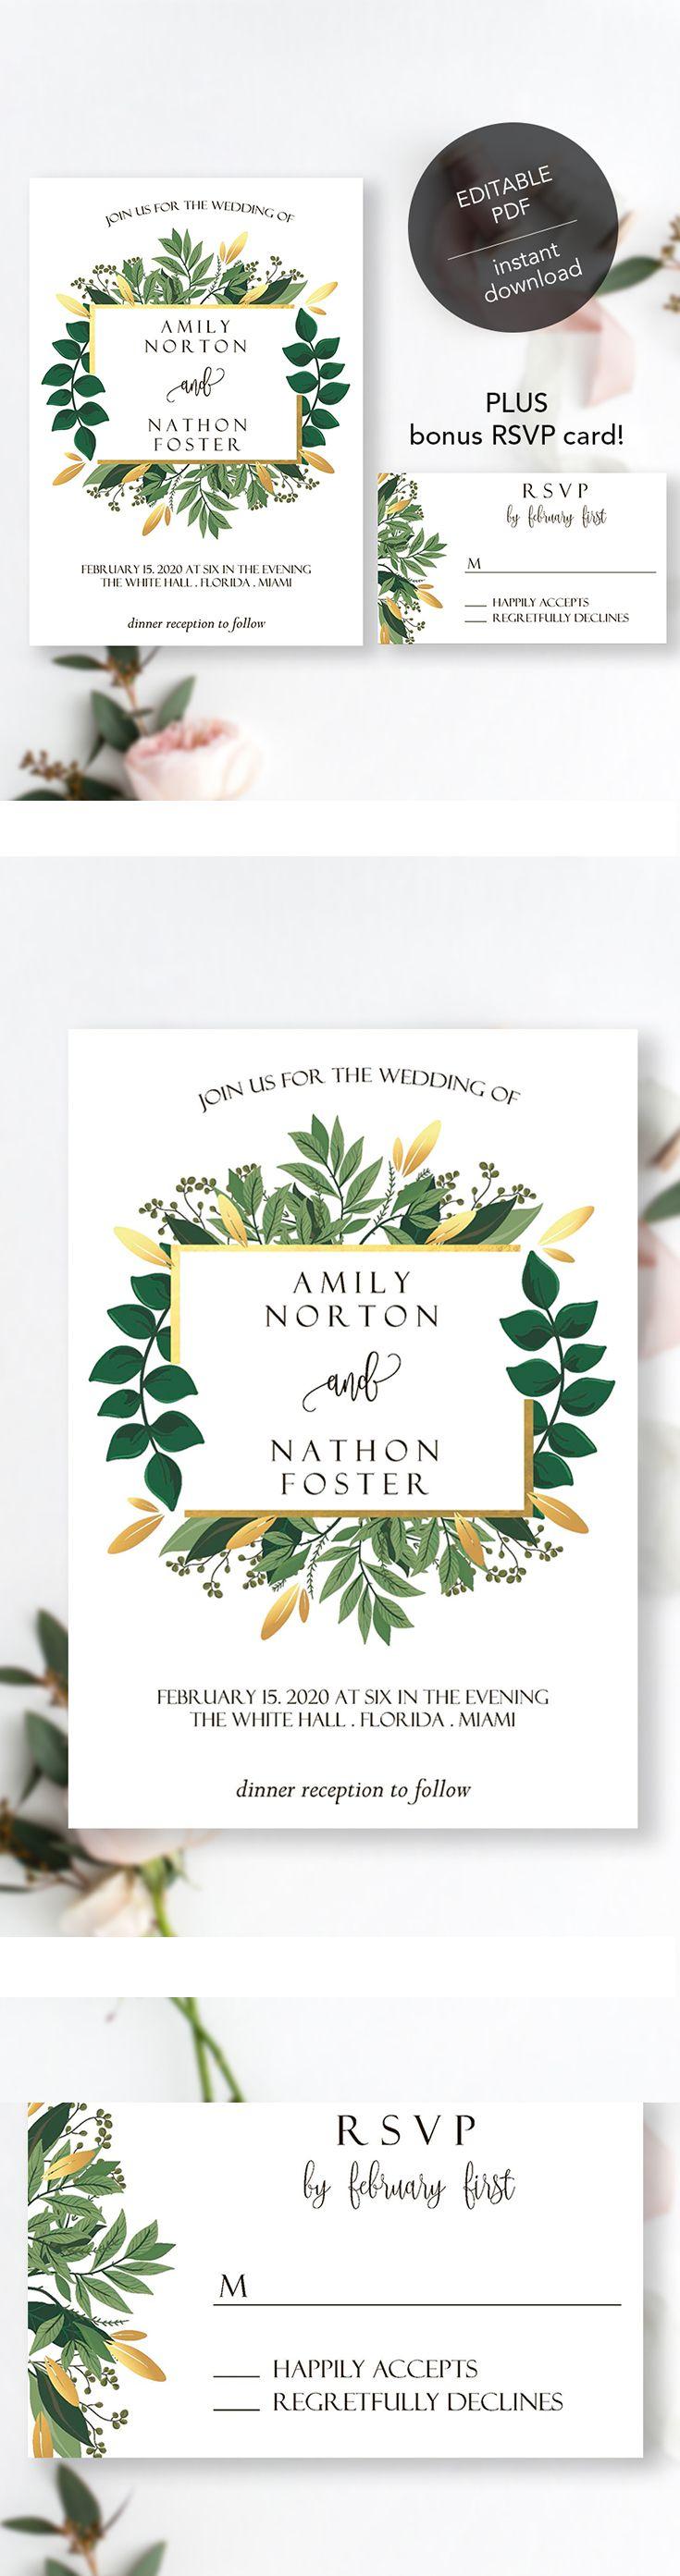 #geometric #geometricwedding #goldwedding #boho #bohowedding #greenery #greenerywedding #weddinginvitation #goldinvitation #goldinvite